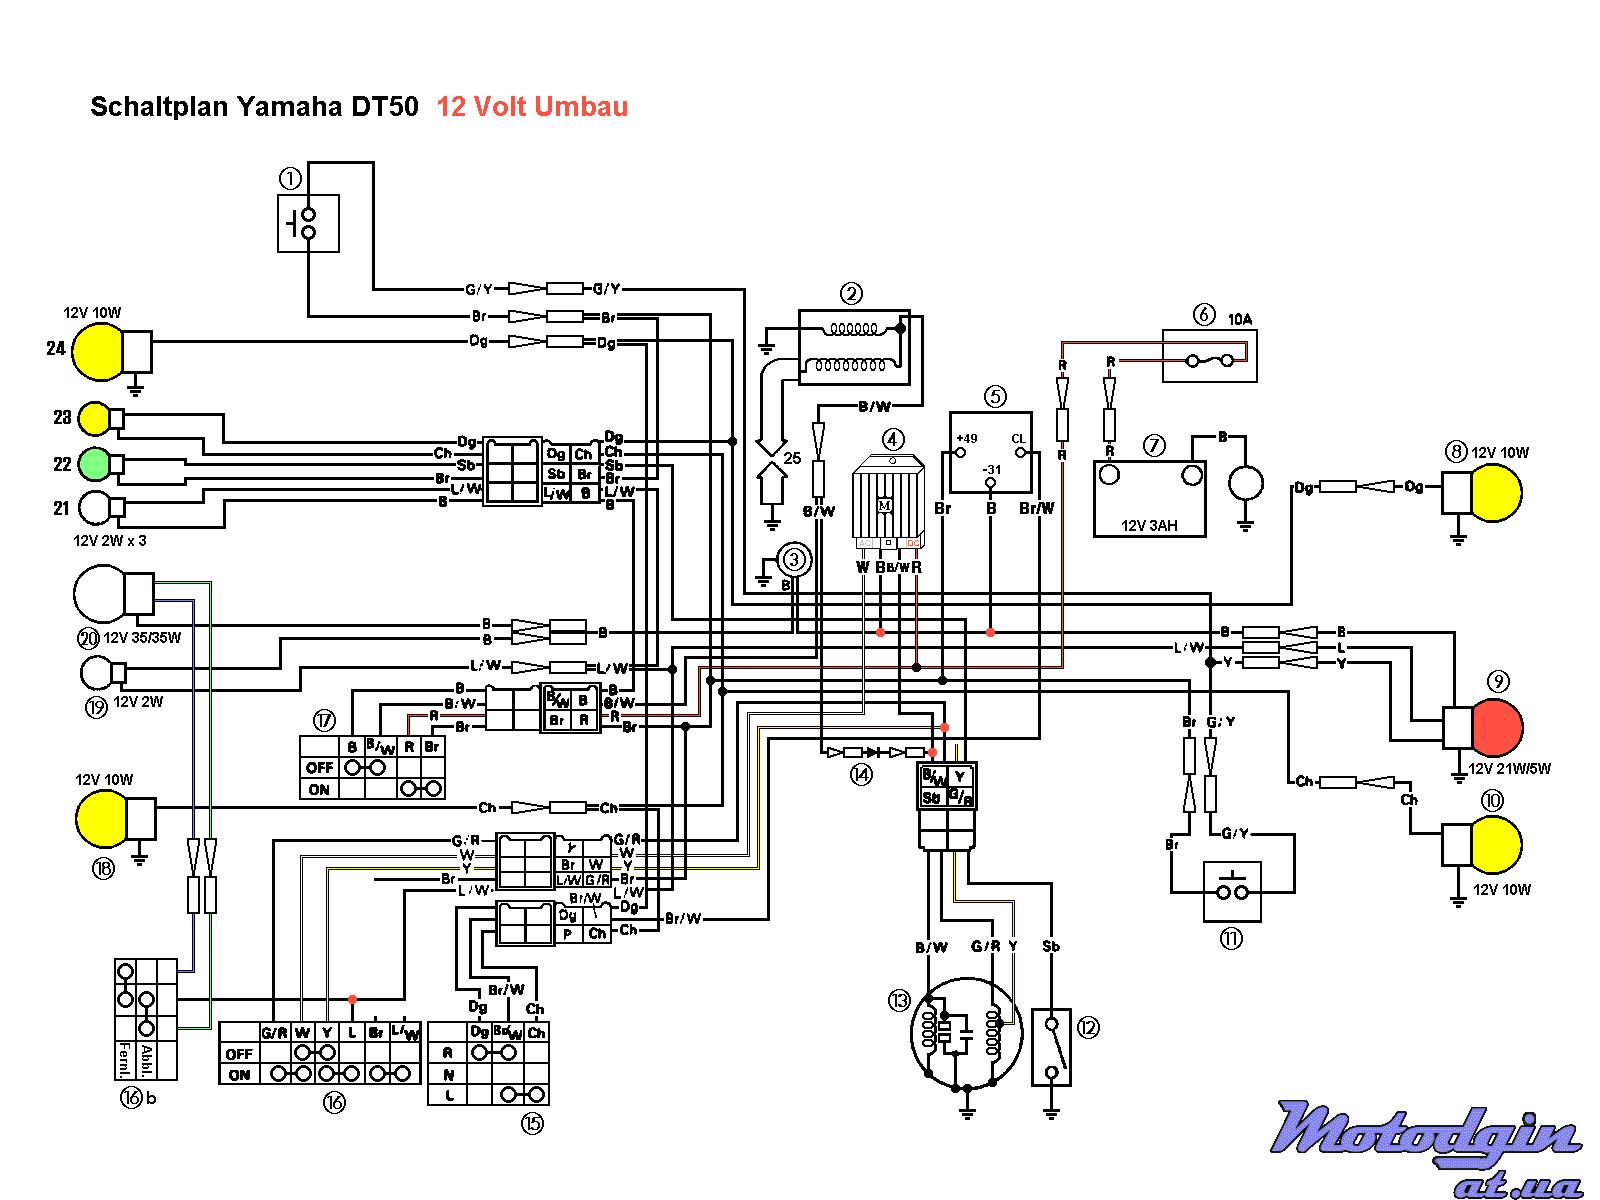 aerox wiring diagram diagram auto wiring diagram yamaha ybr 125 fuse box